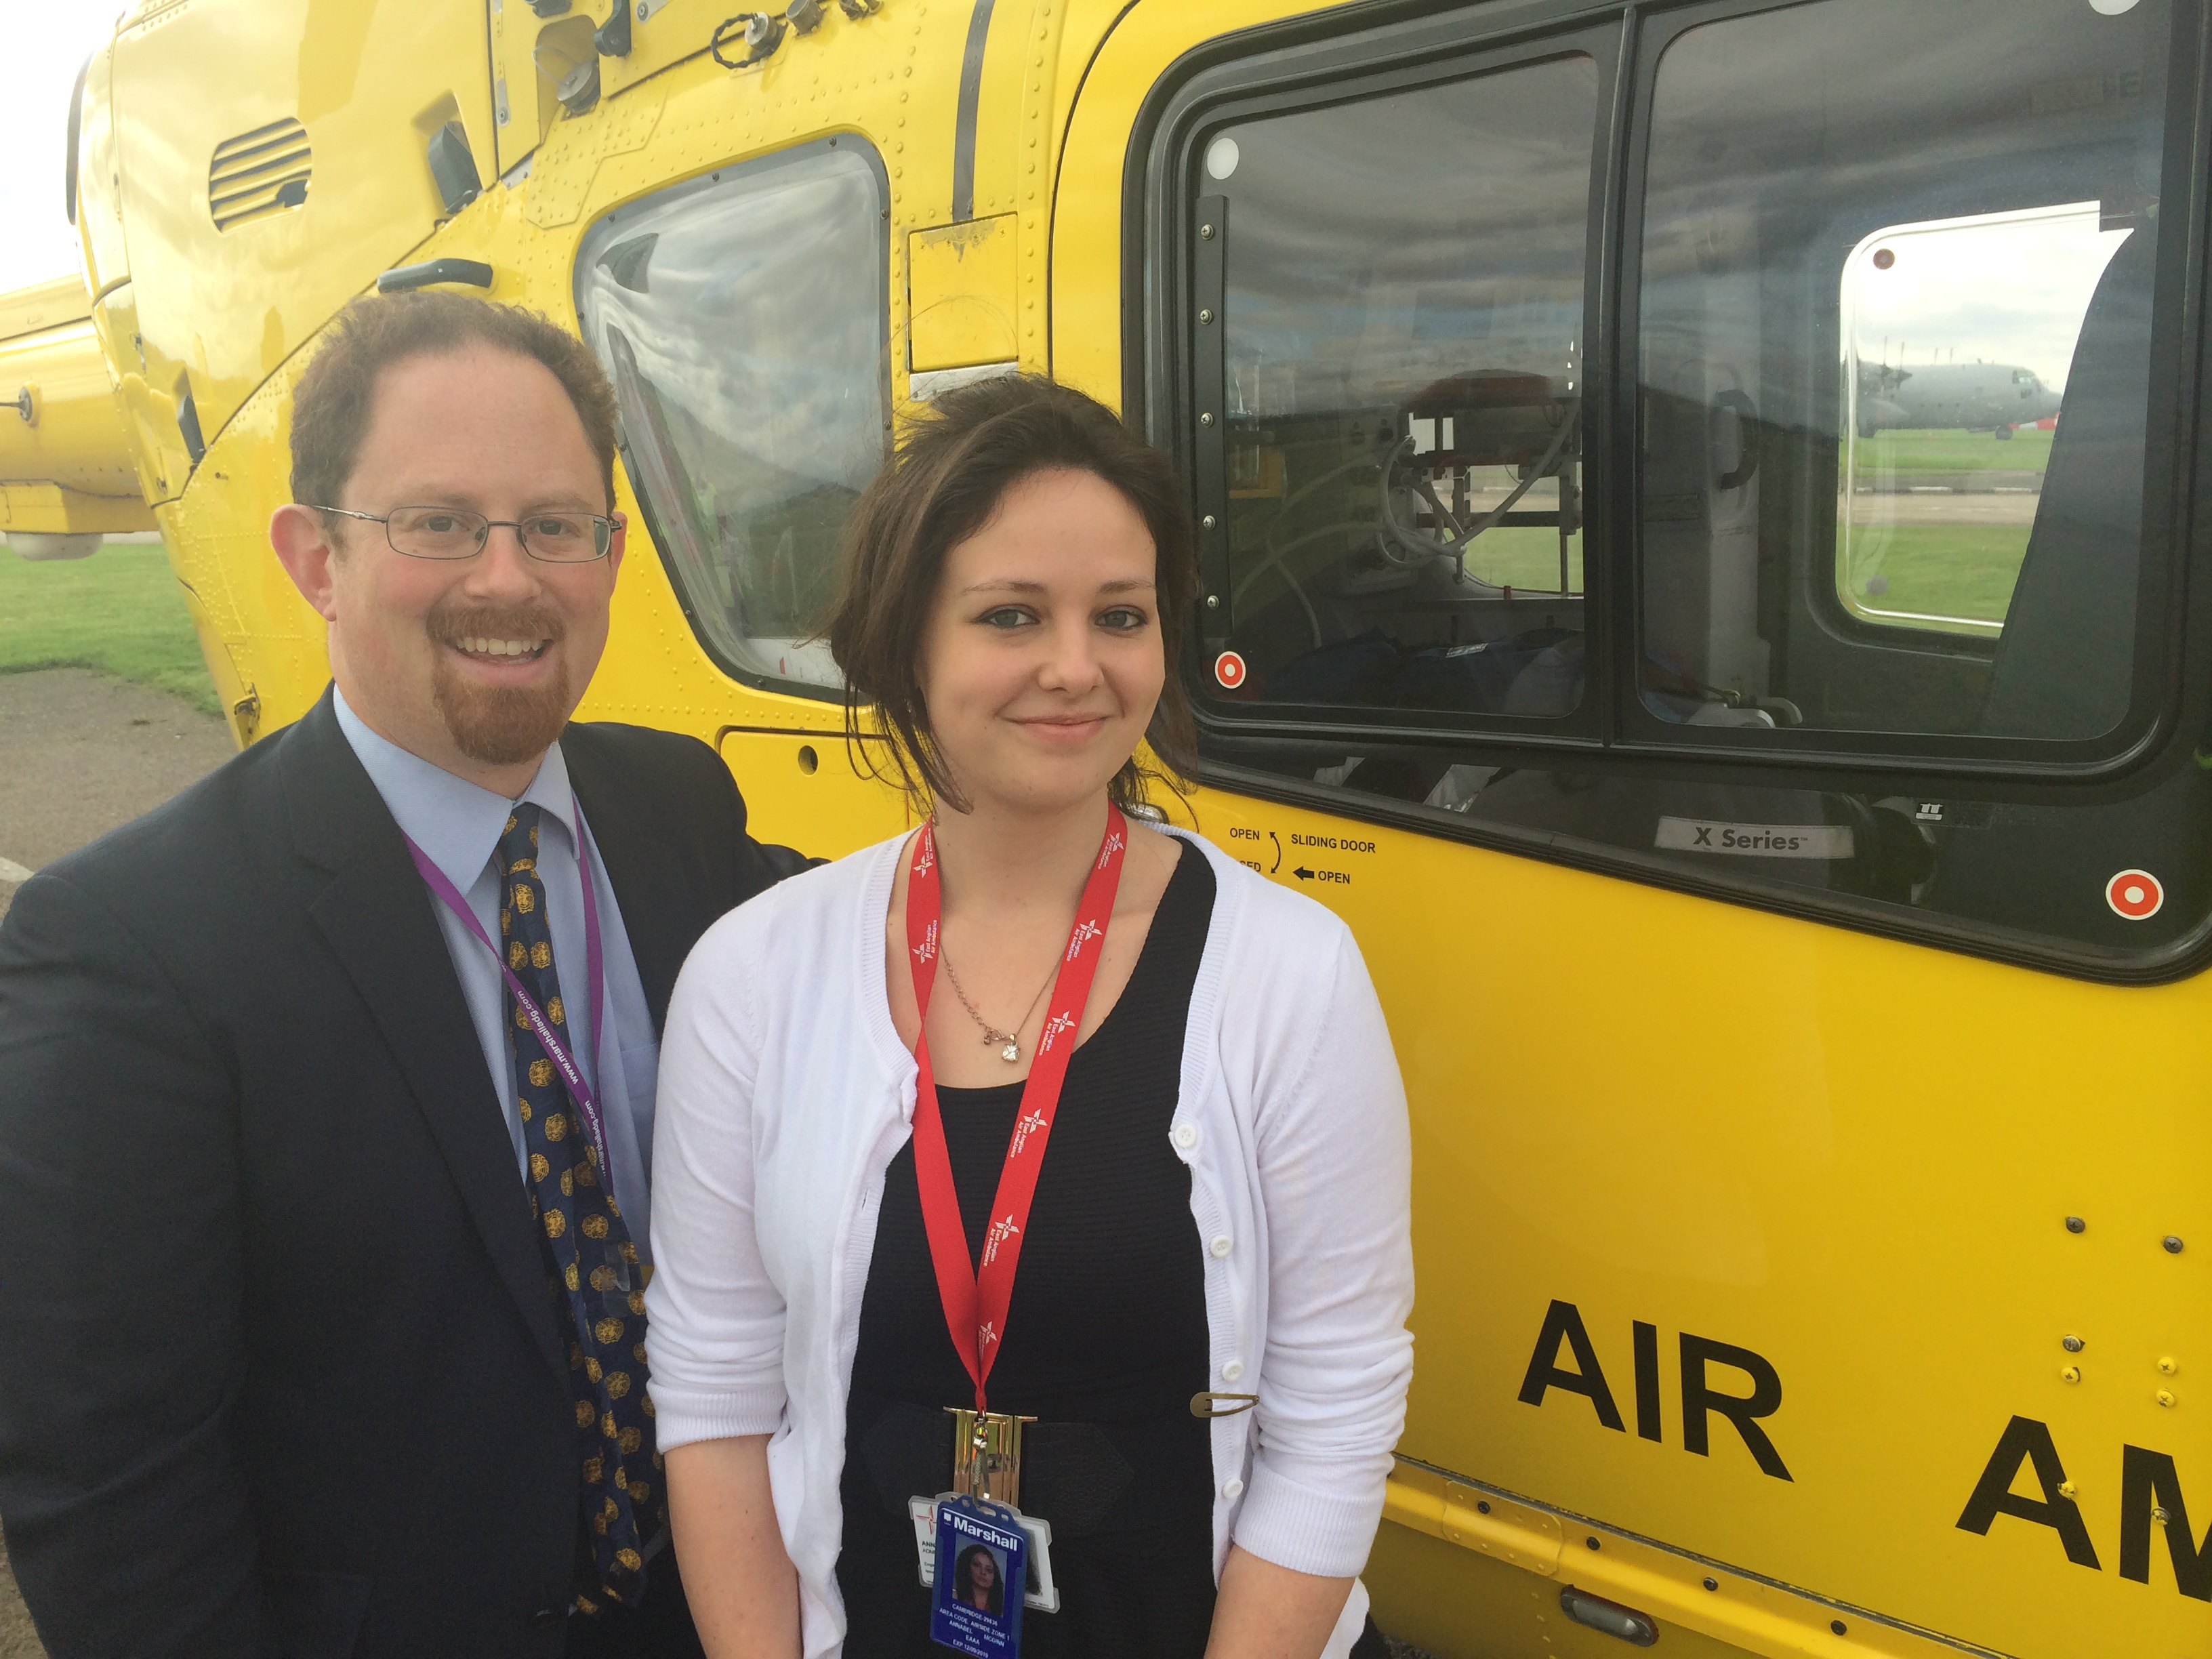 air_ambulance_apprentice.JPG